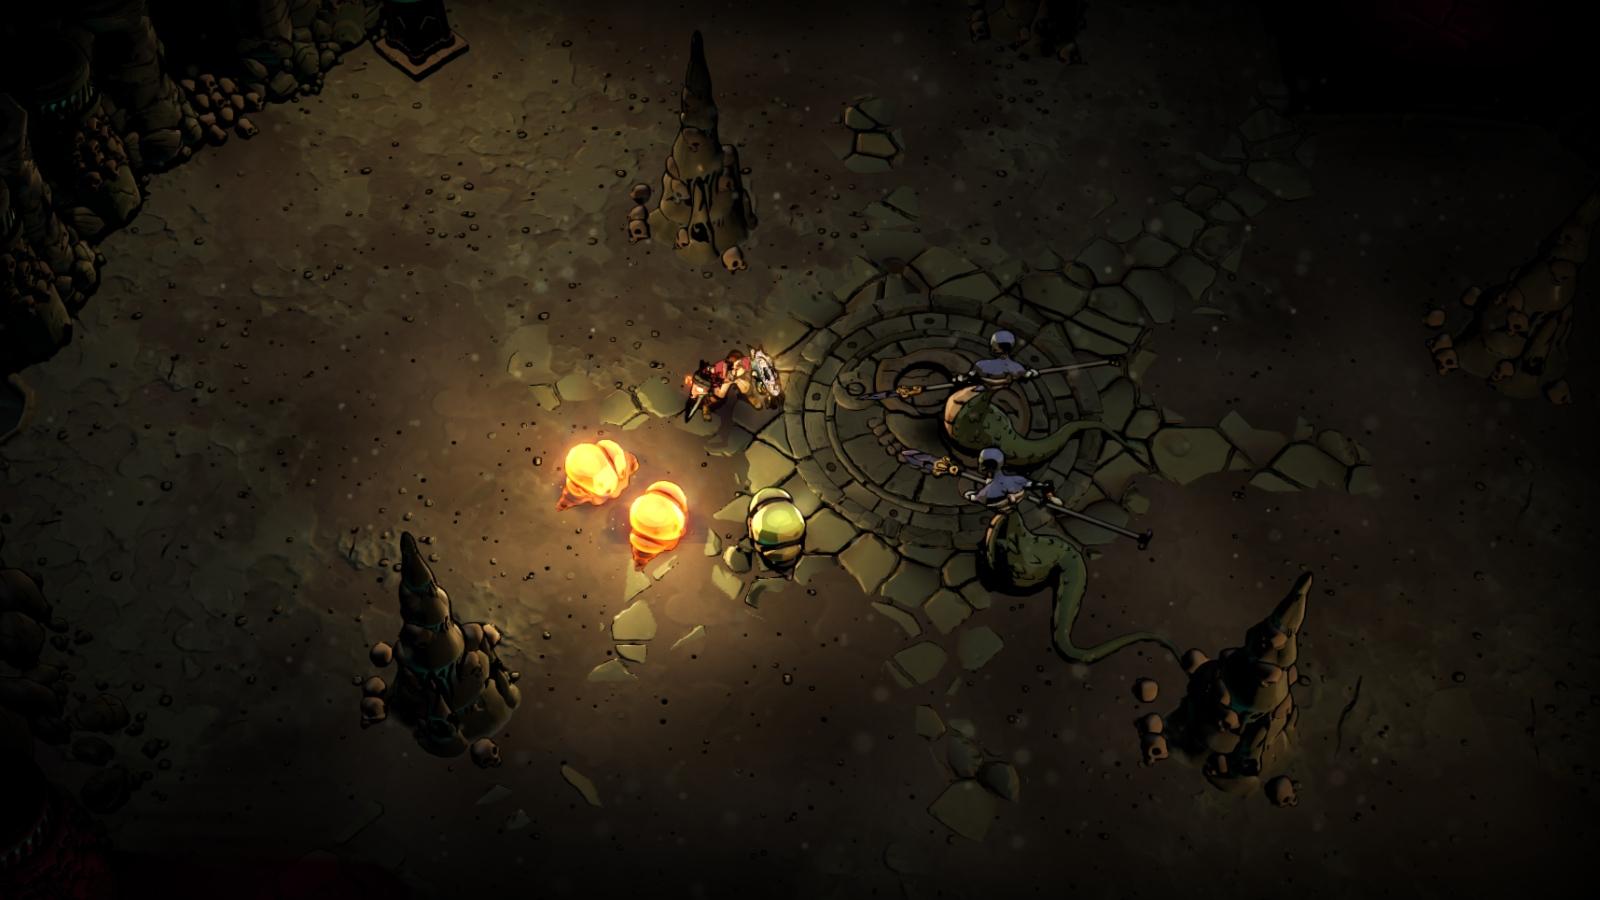 Curse of the Dead Gods - Serpent's Catacombs Update | Passtech Games, Focus Home Interactive